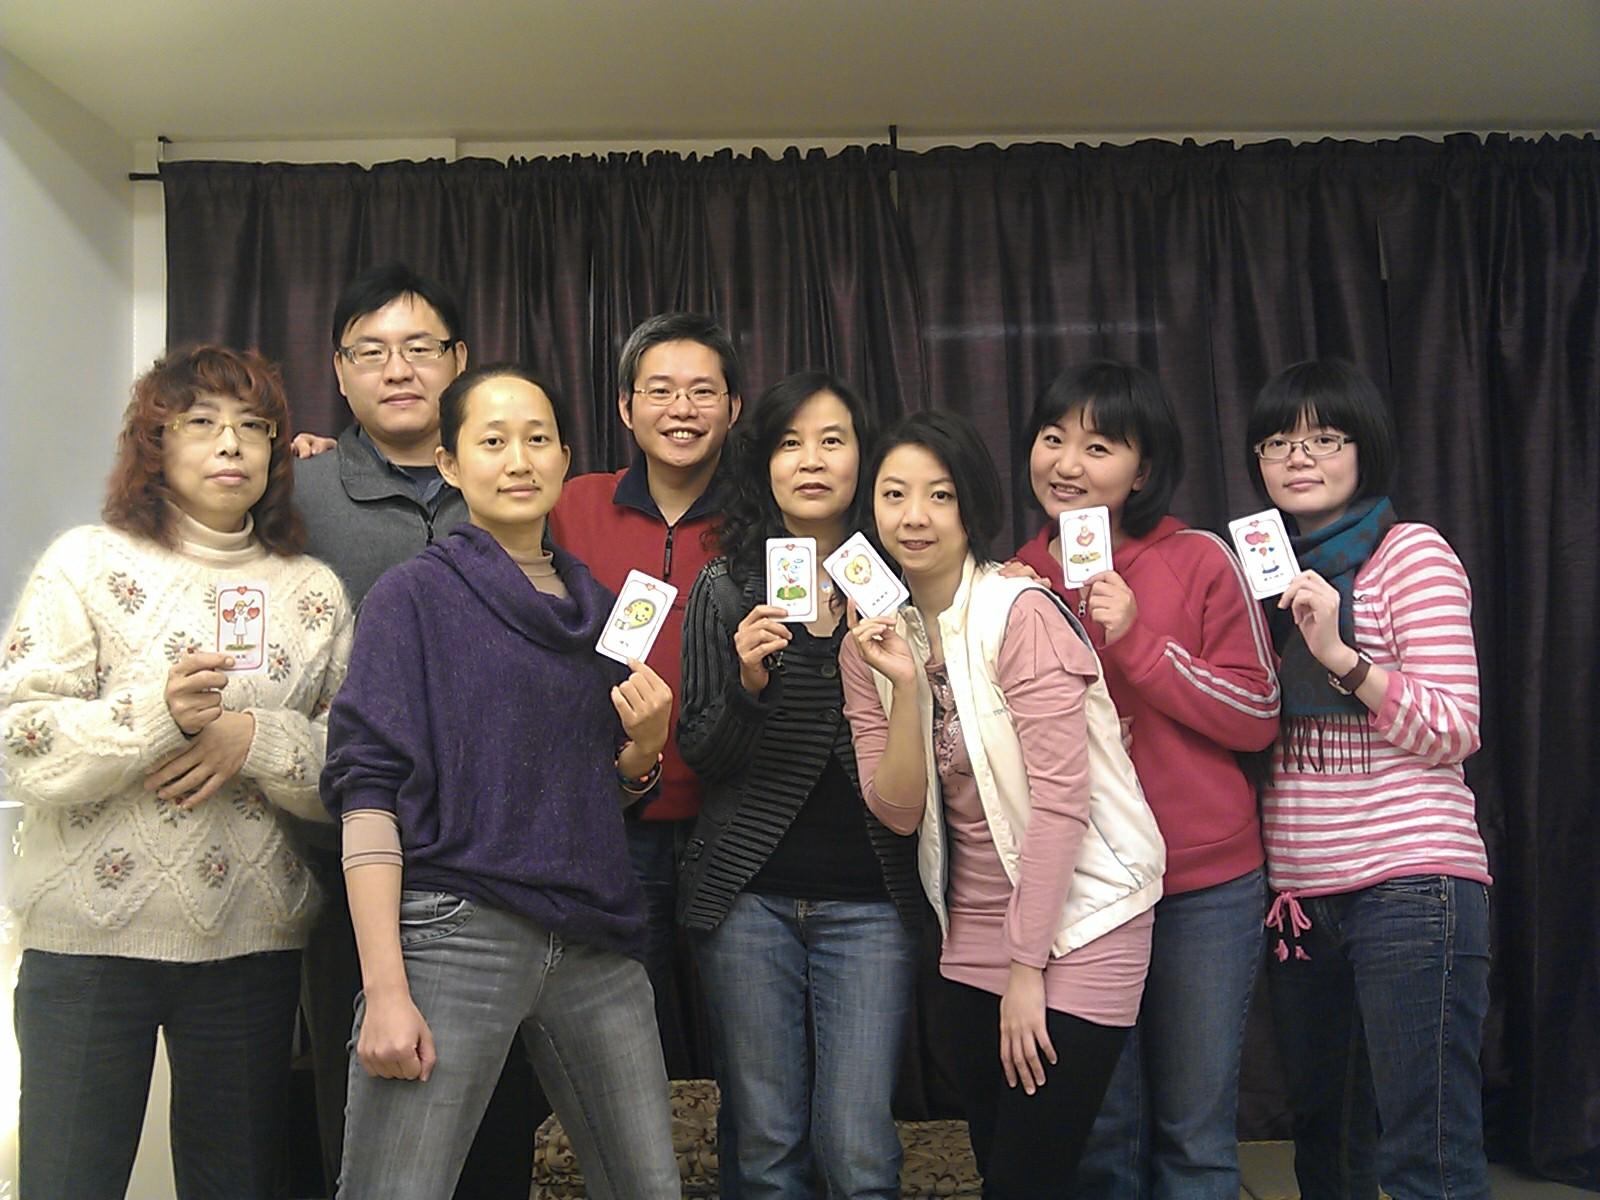 C360_2011-12-25-17-05-03.jpg